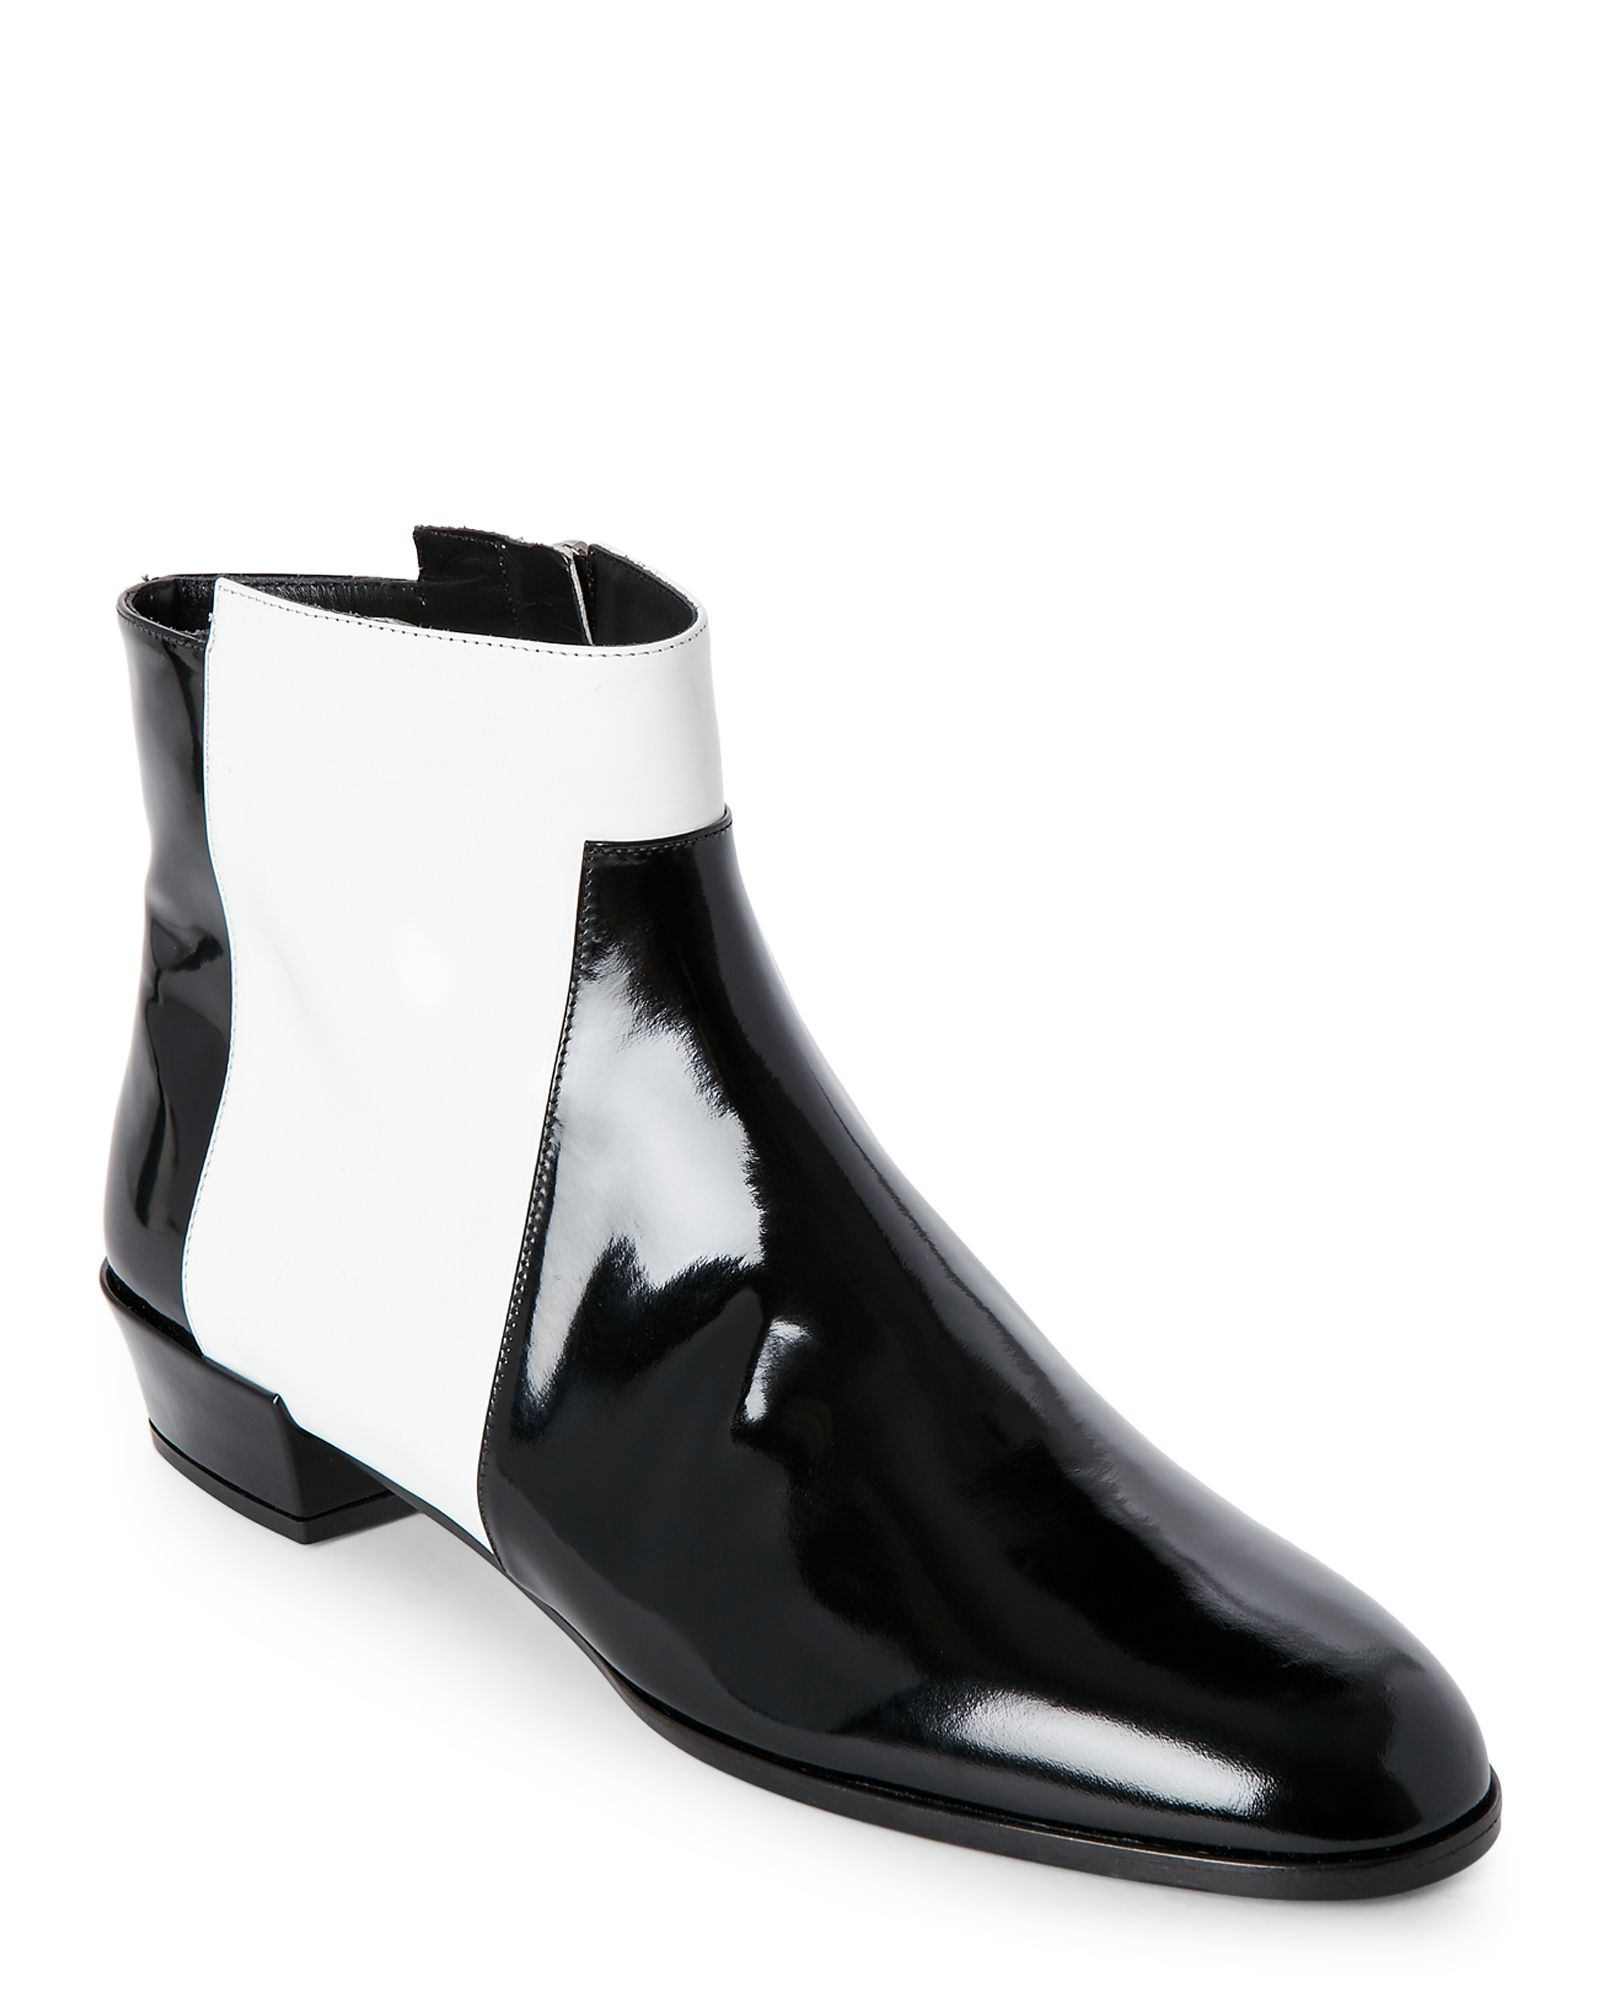 33ce42537ee5 Roger Vivier Black   White Color Block Ankle Boots